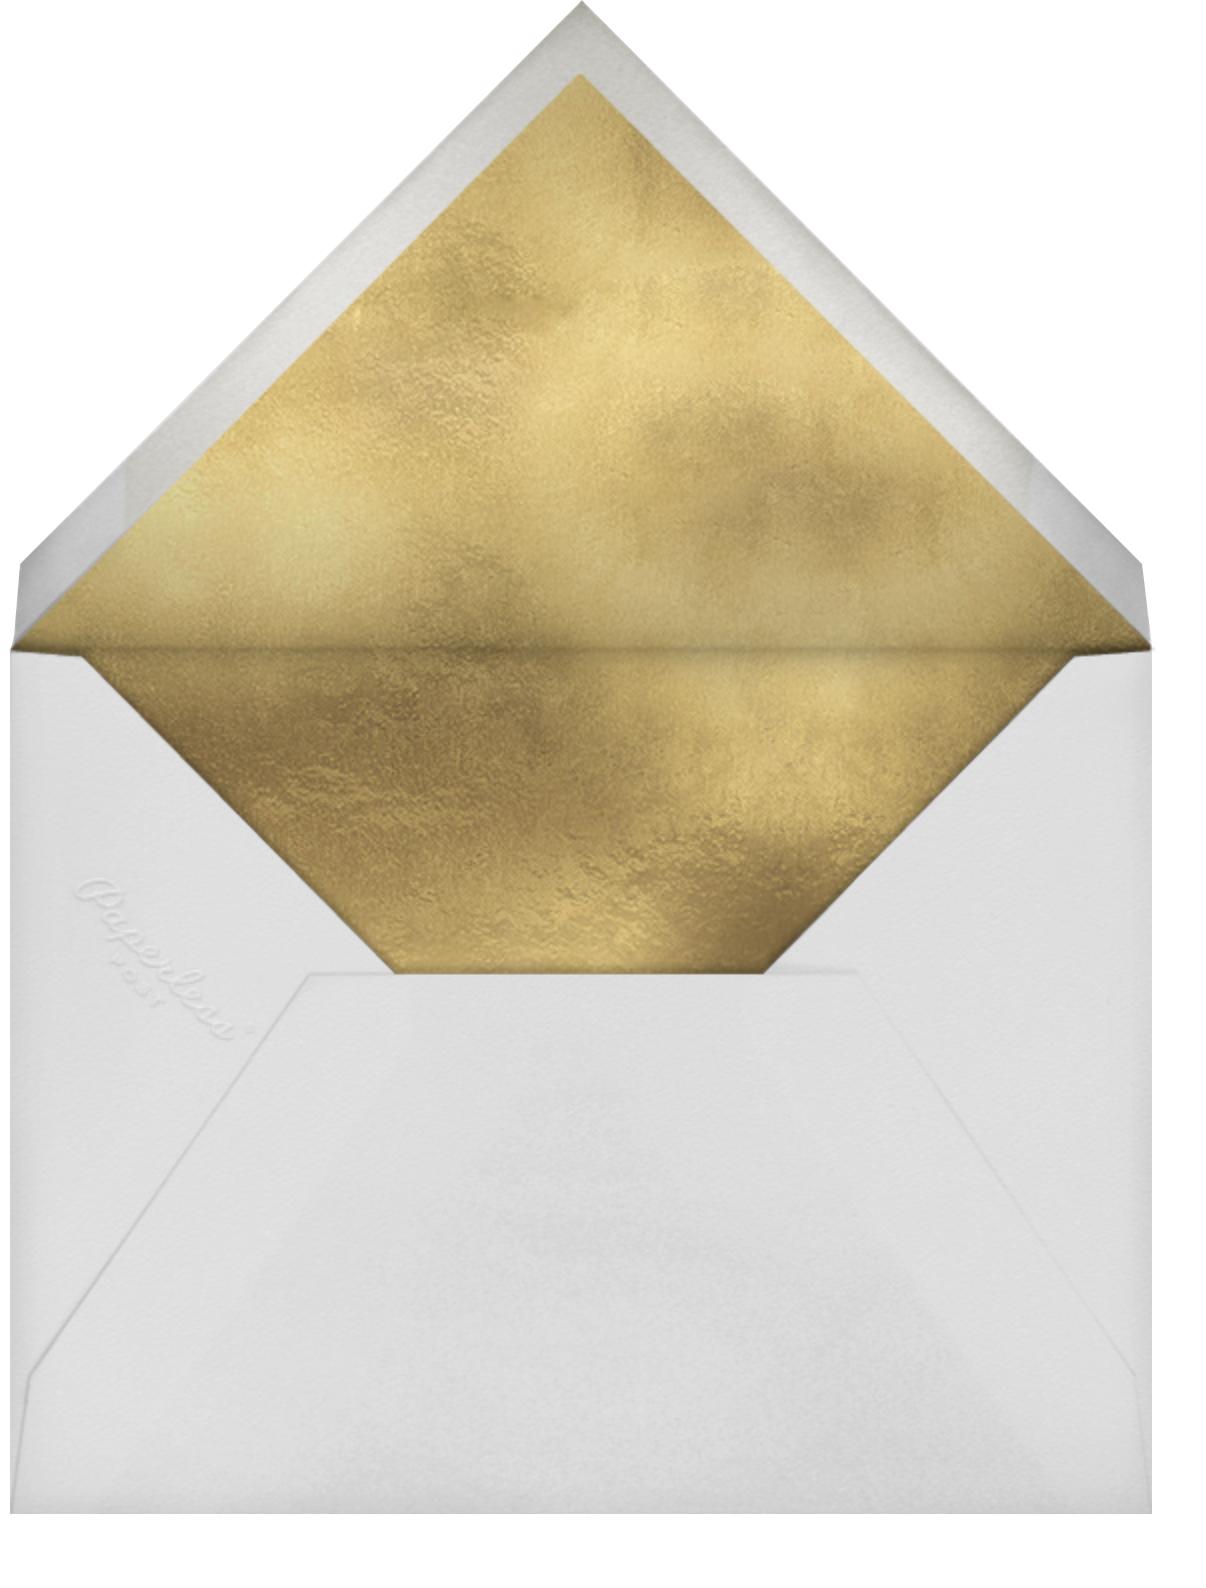 Wildflower Calico - White/Blossom - Oscar de la Renta - Mother's Day - envelope back